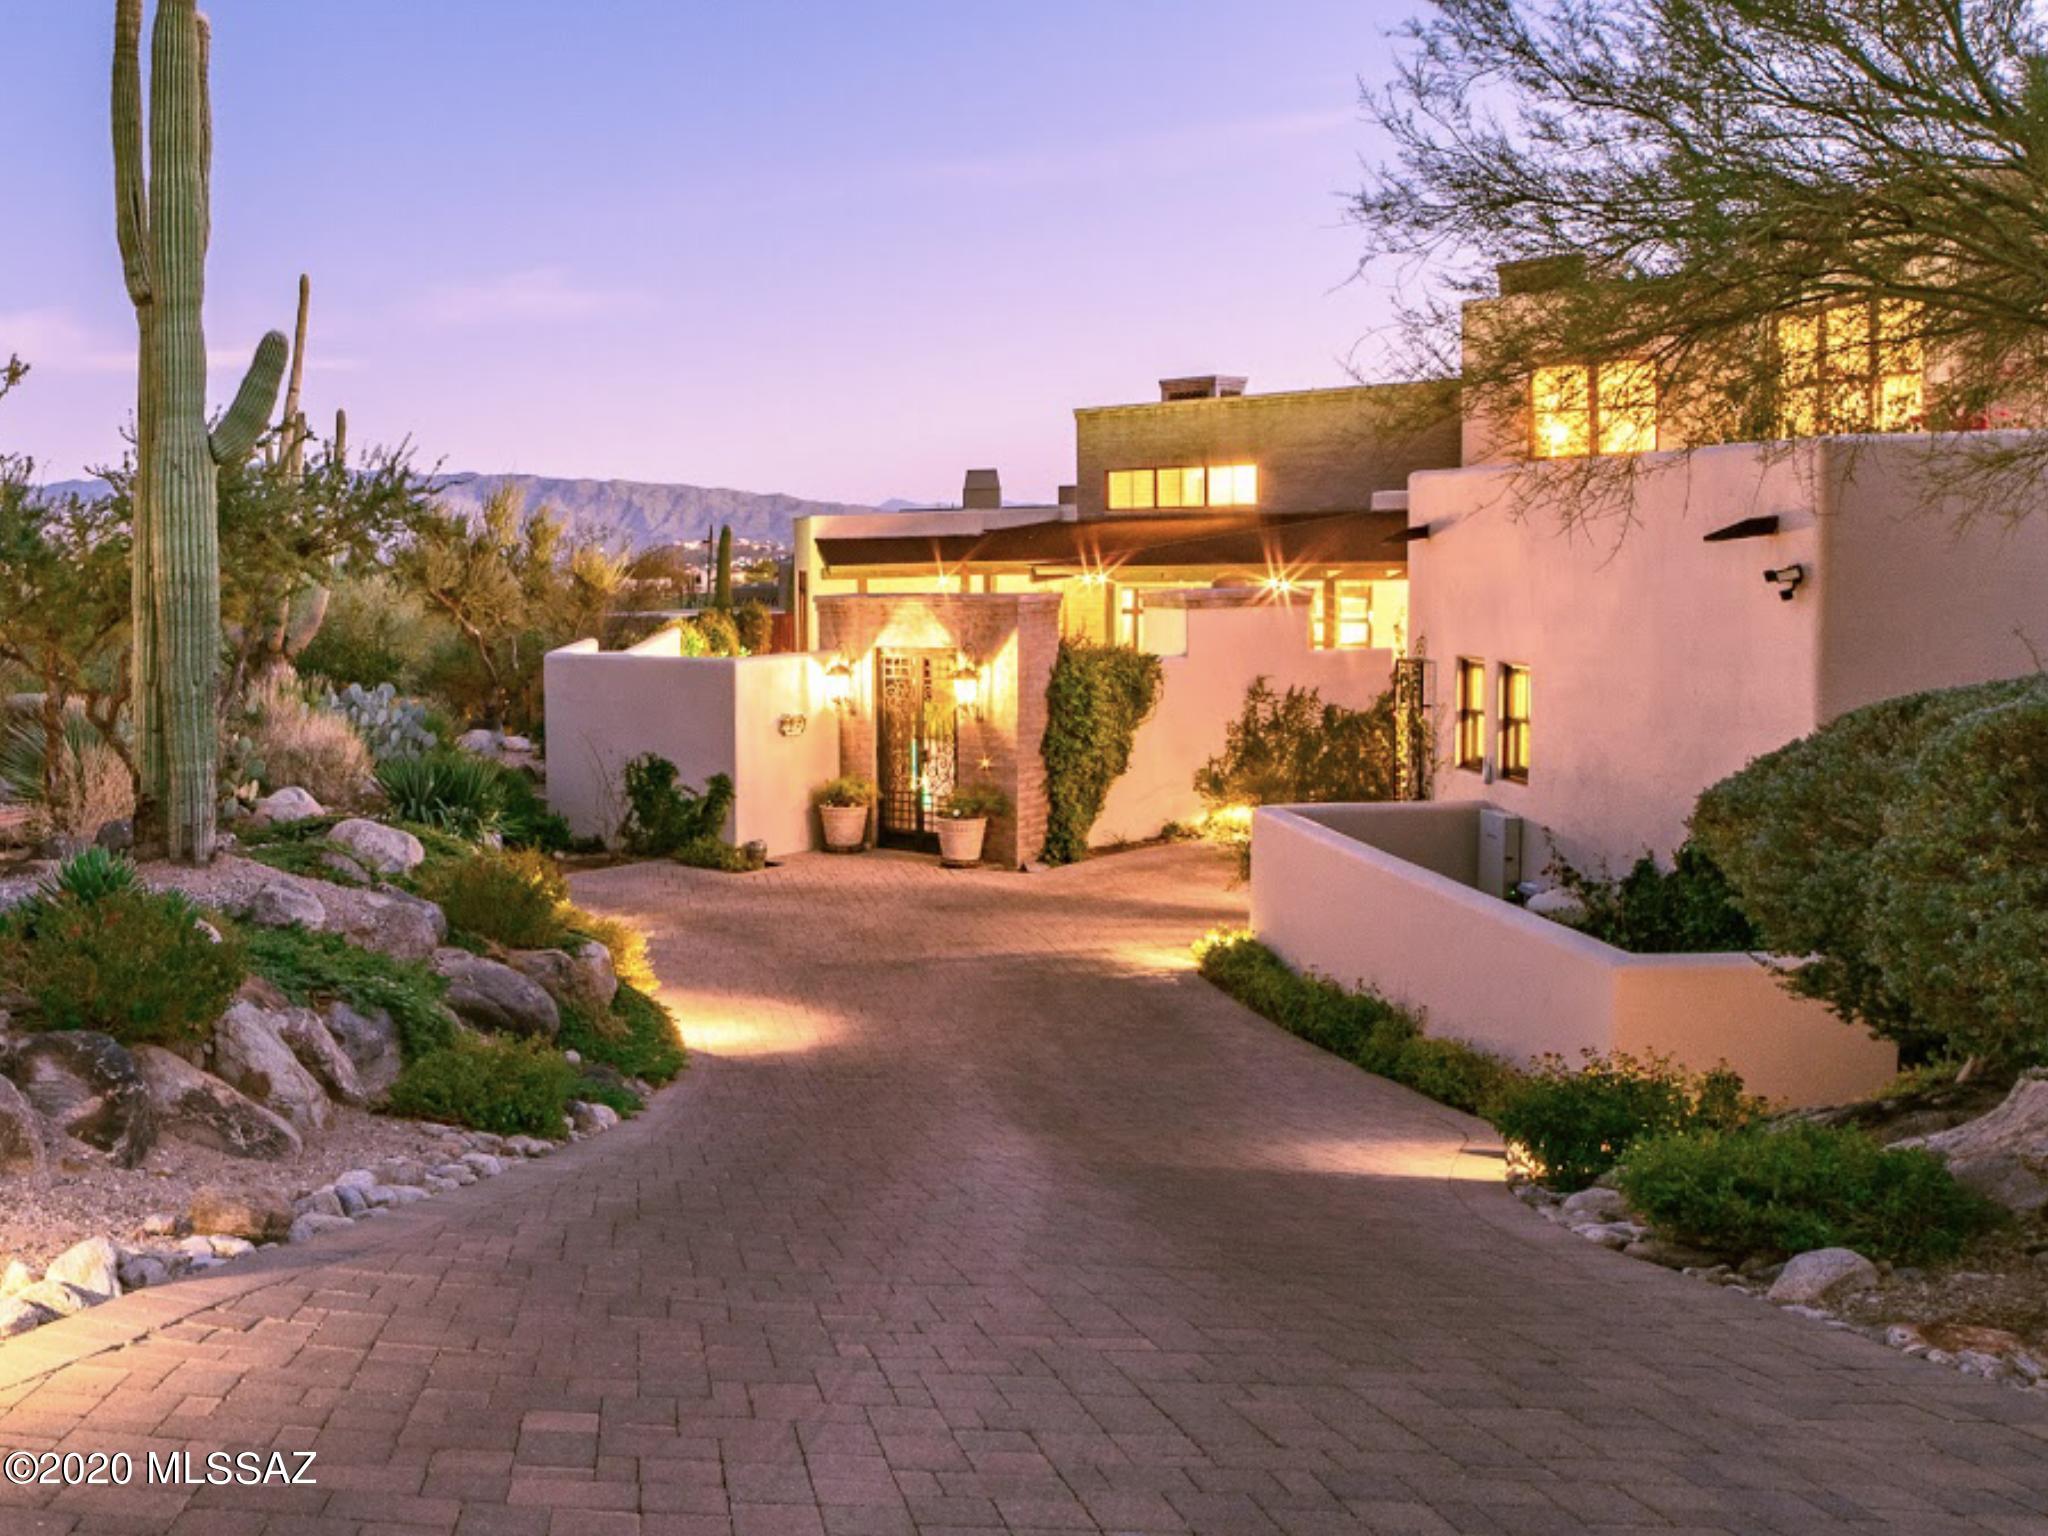 Photo of 6486 N Lazulite Place, Tucson, AZ 85750